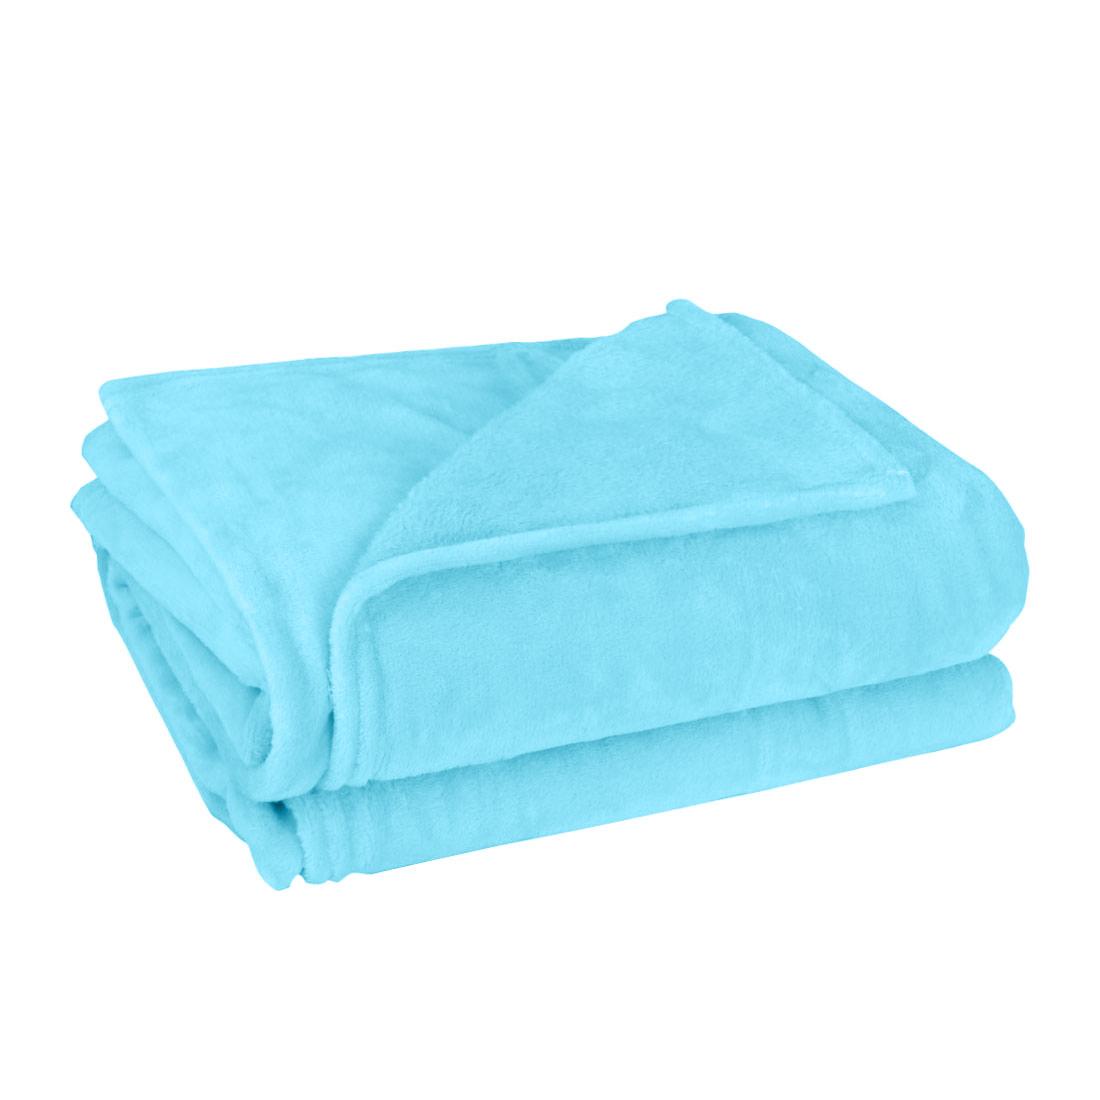 Sofa Polyester Plush Throw Blanket Warm Soft Pure Sky Blue King Size 200 x 230cm